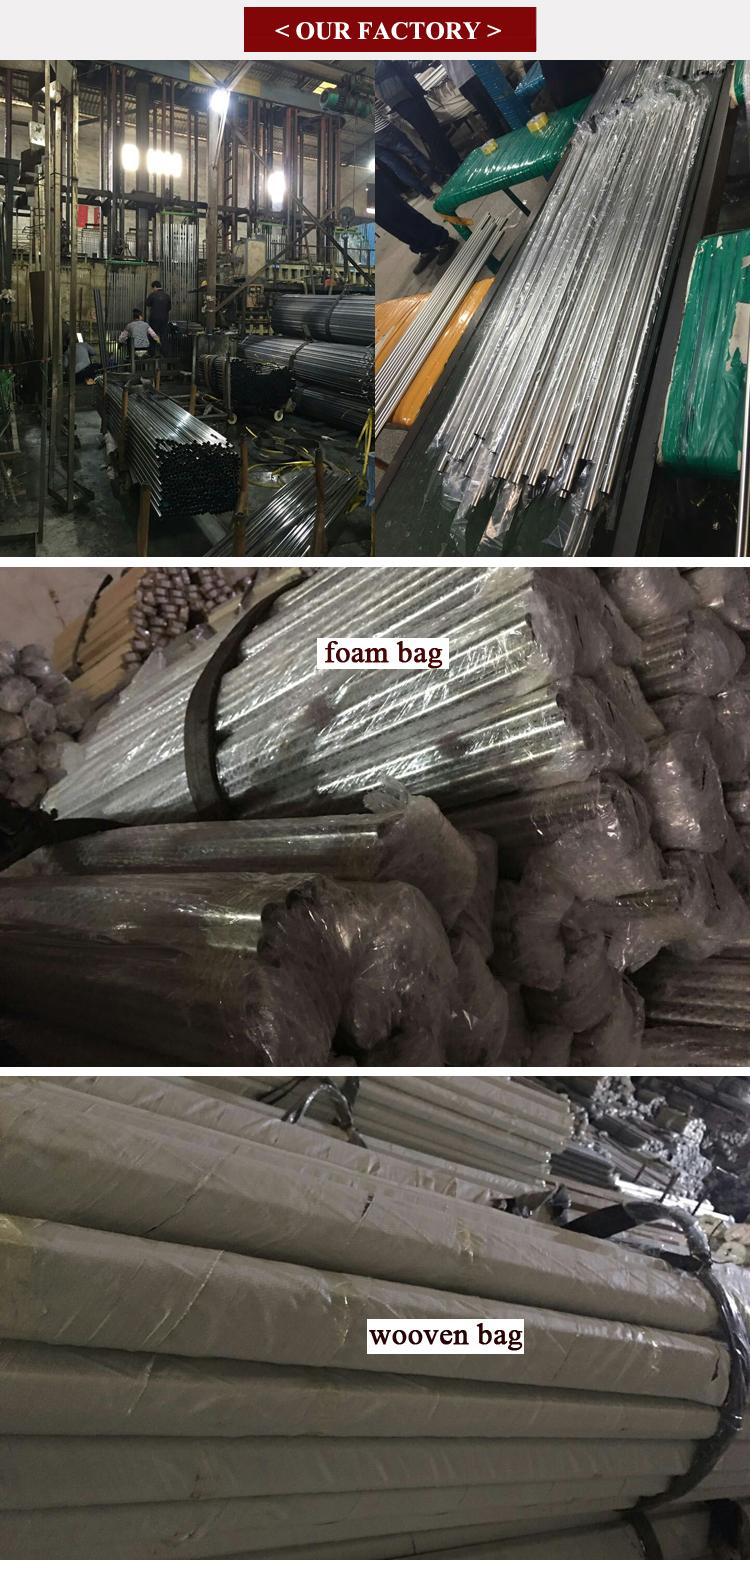 Meubels Pipes Fitting 16mm 19mm 25mm Diameter Garderobe Buizen Houder Kast Staaf Flenzen Chrome Staal Pijp Ronde buis Flens